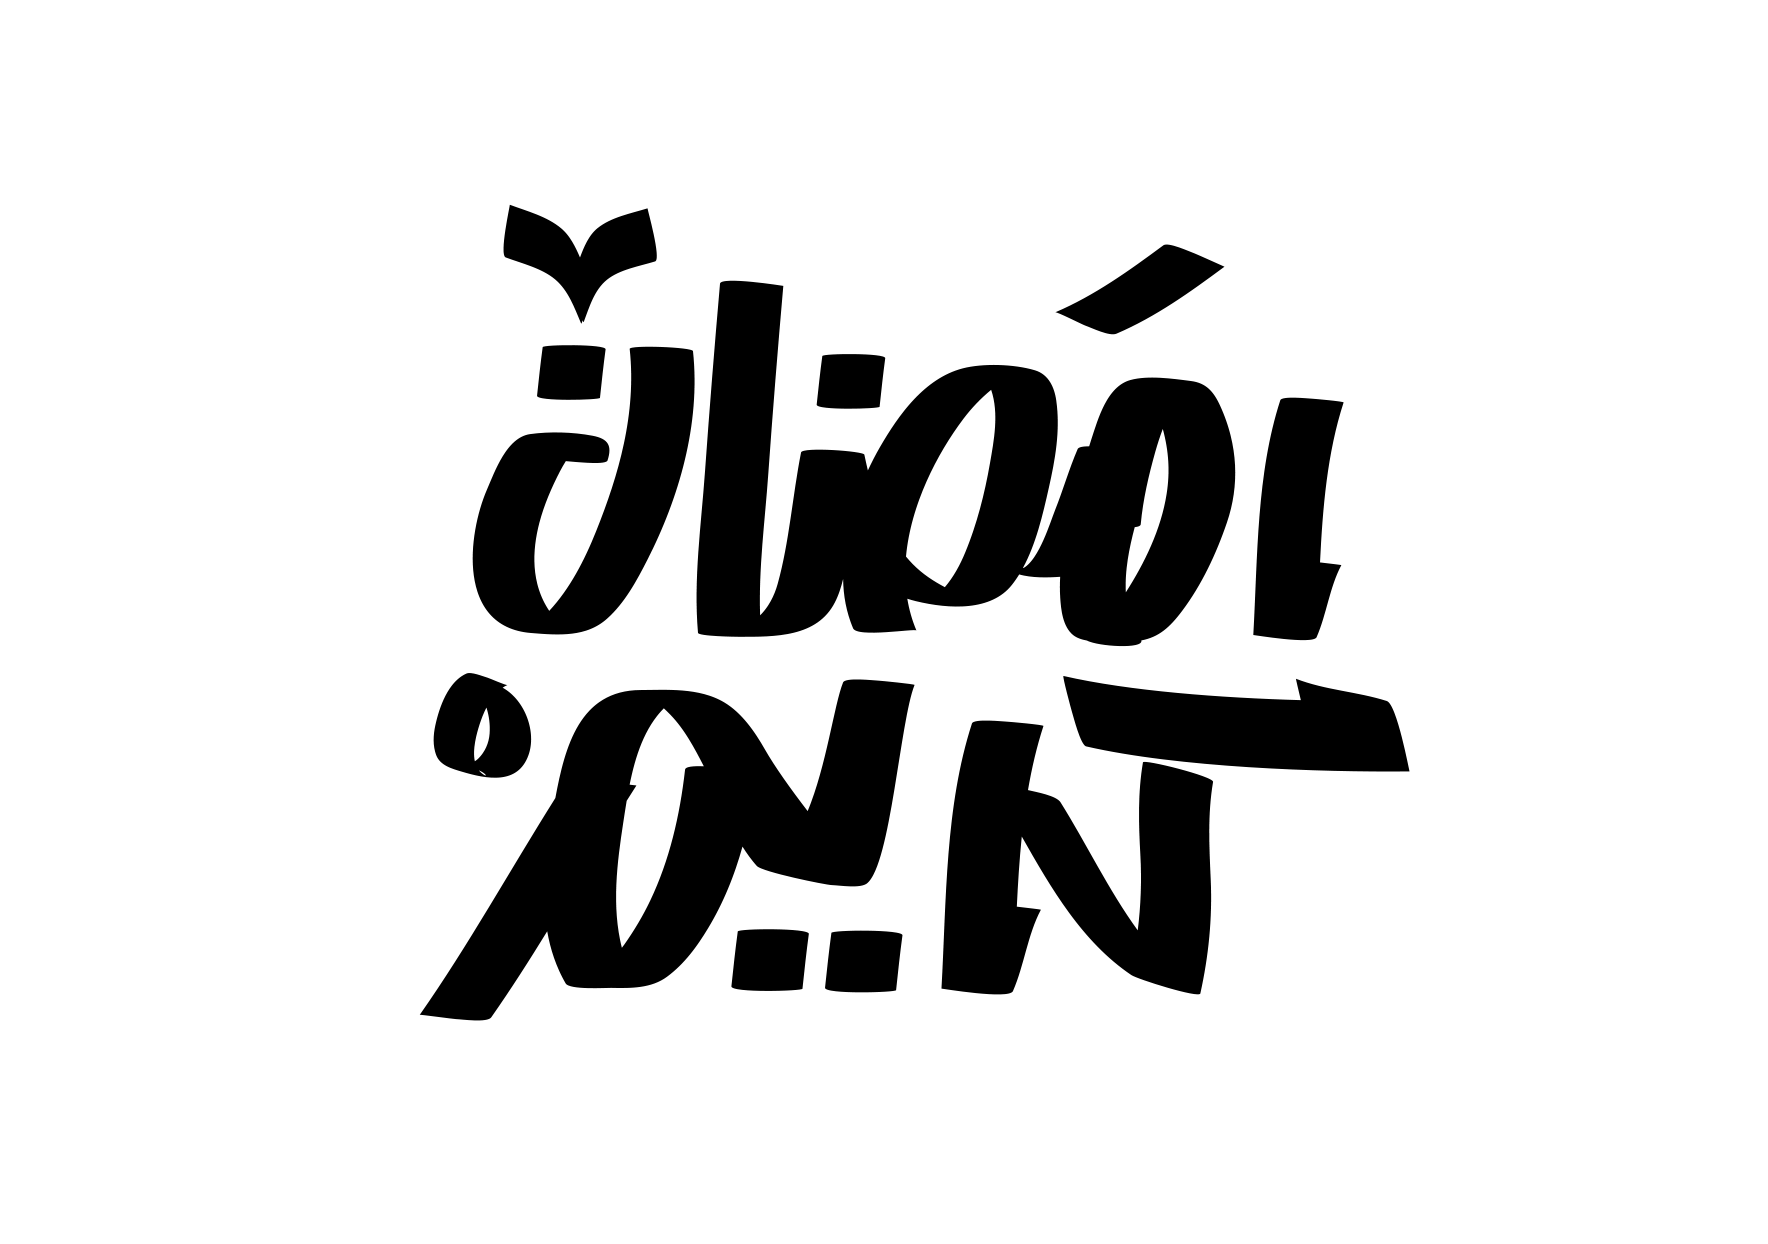 مخطوطه رمضان كريم مفرغه 14 15 مخطوطه لشهر رمضان بالخط الحر png